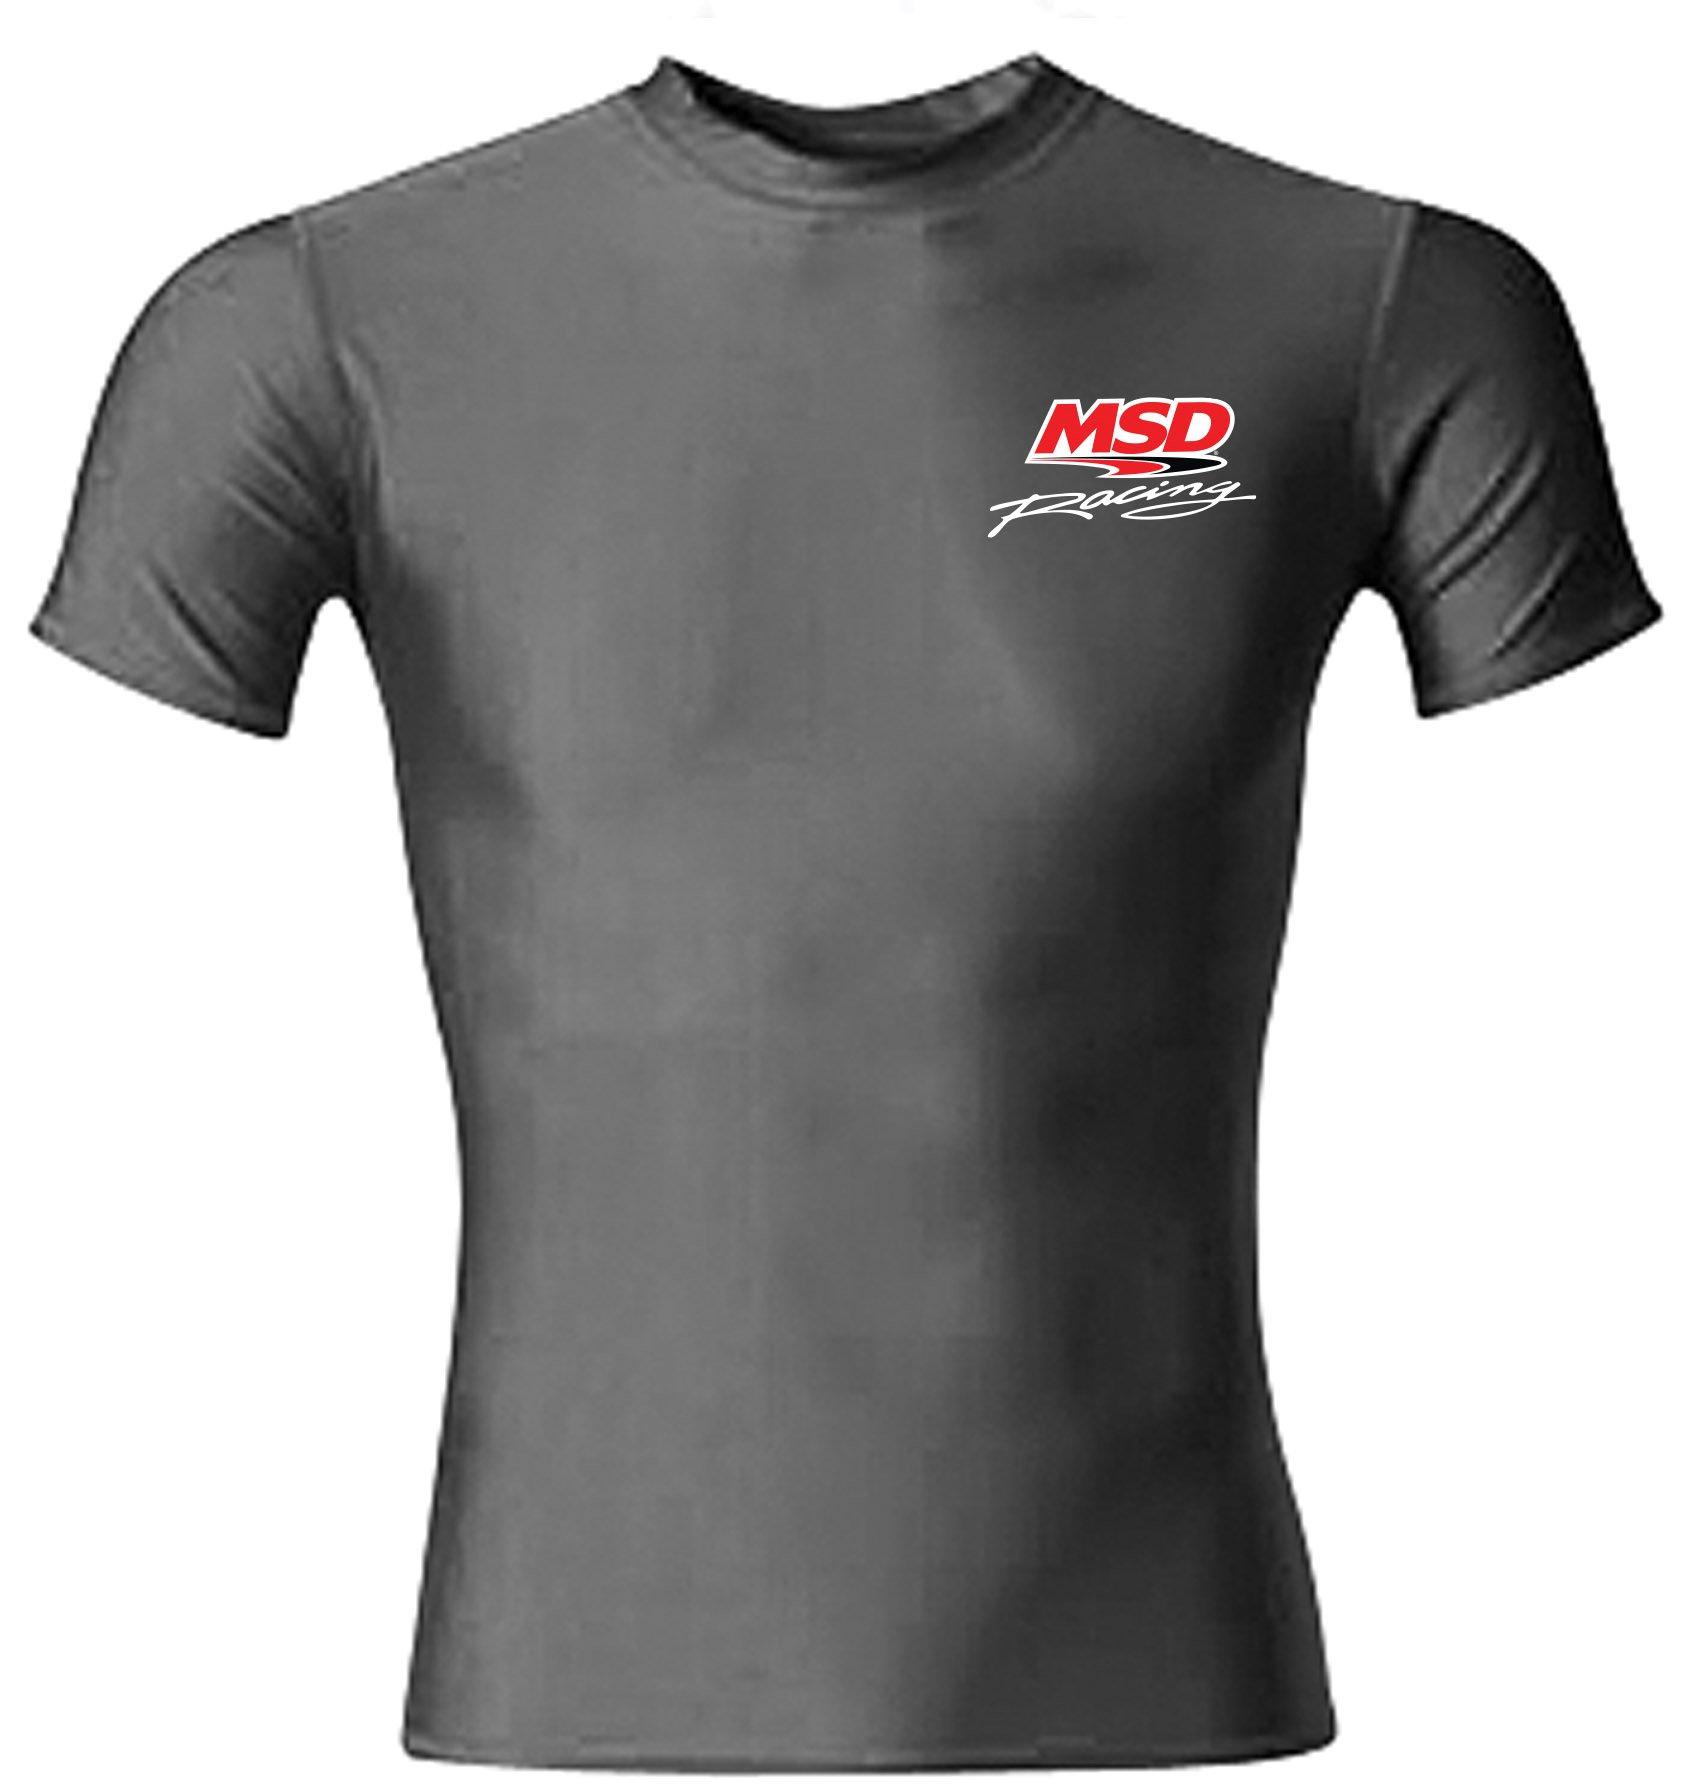 95454 - MSD Compression Crew Shirt, Black, XX-Large Image